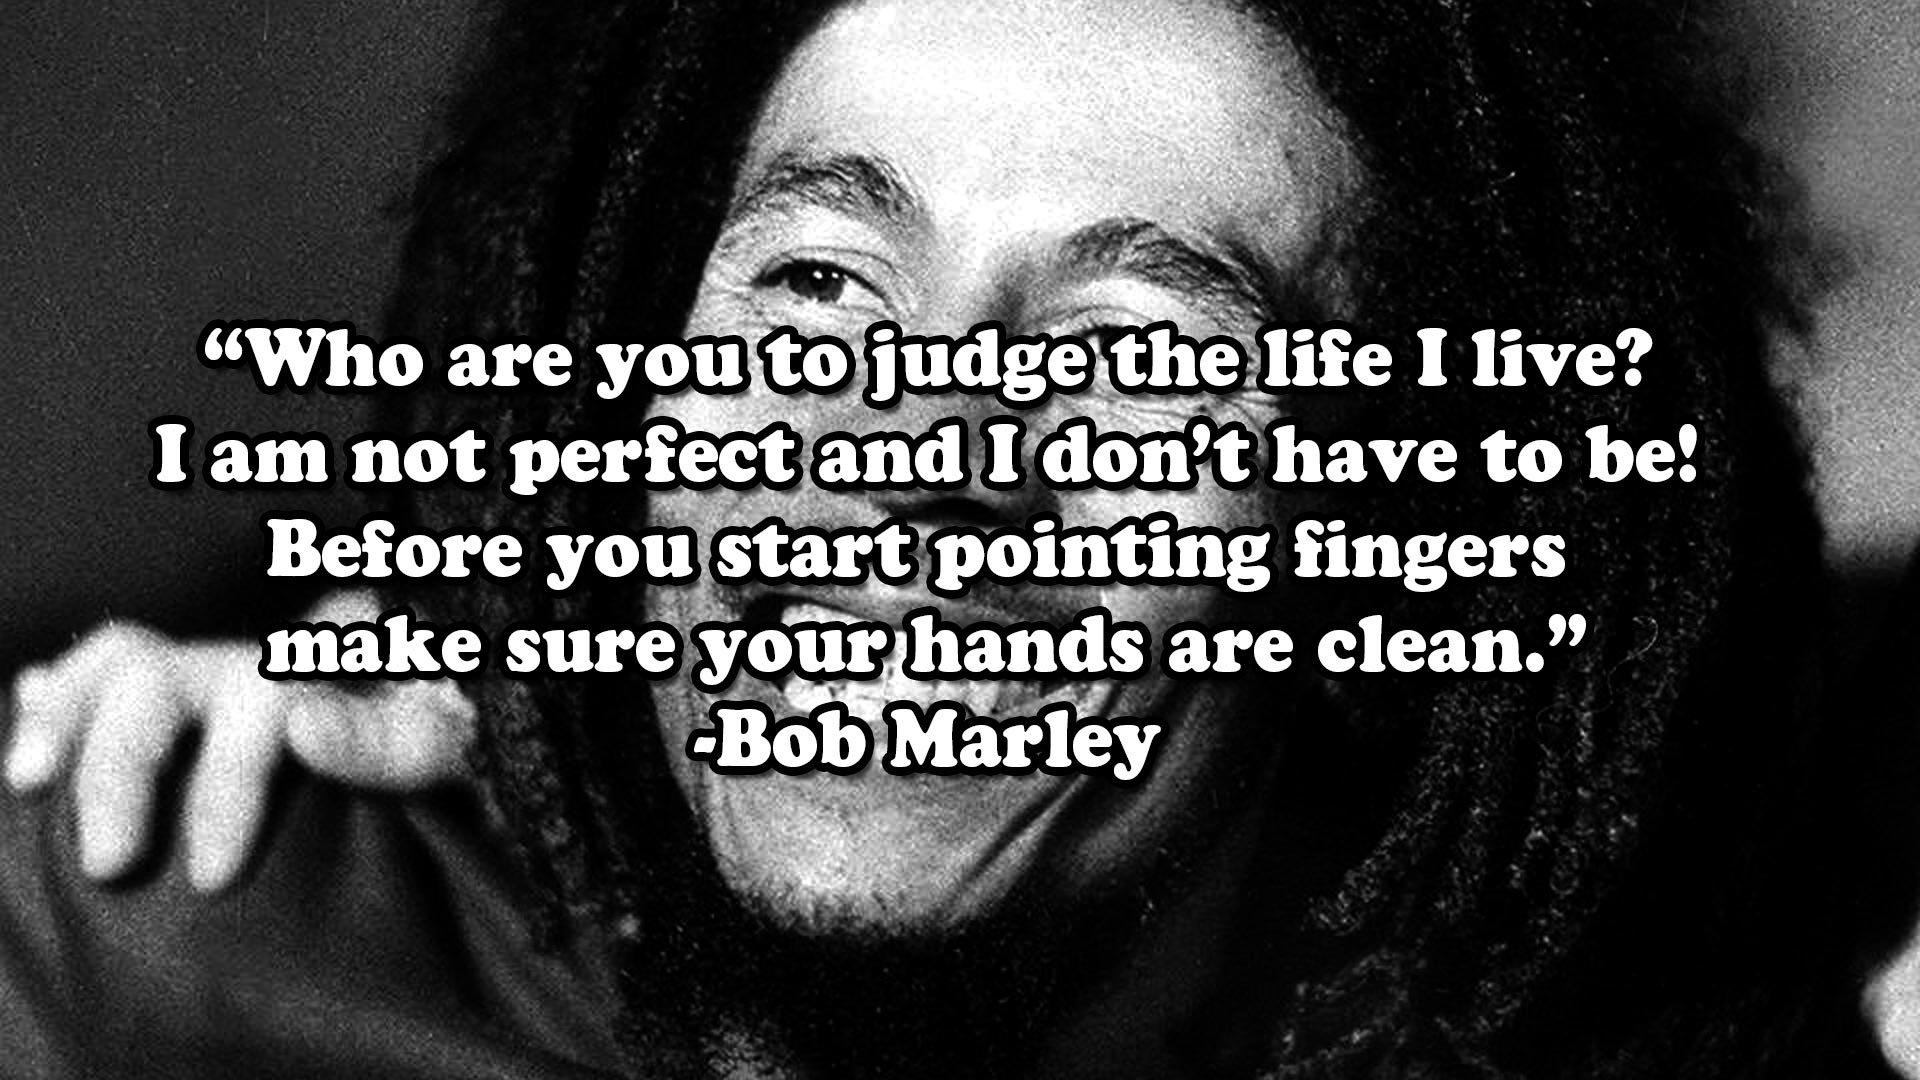 Musical Birthday Quotes Wallpapers Bob Marley Reggae Singer Marijuana 420 Quote Sadic Mood